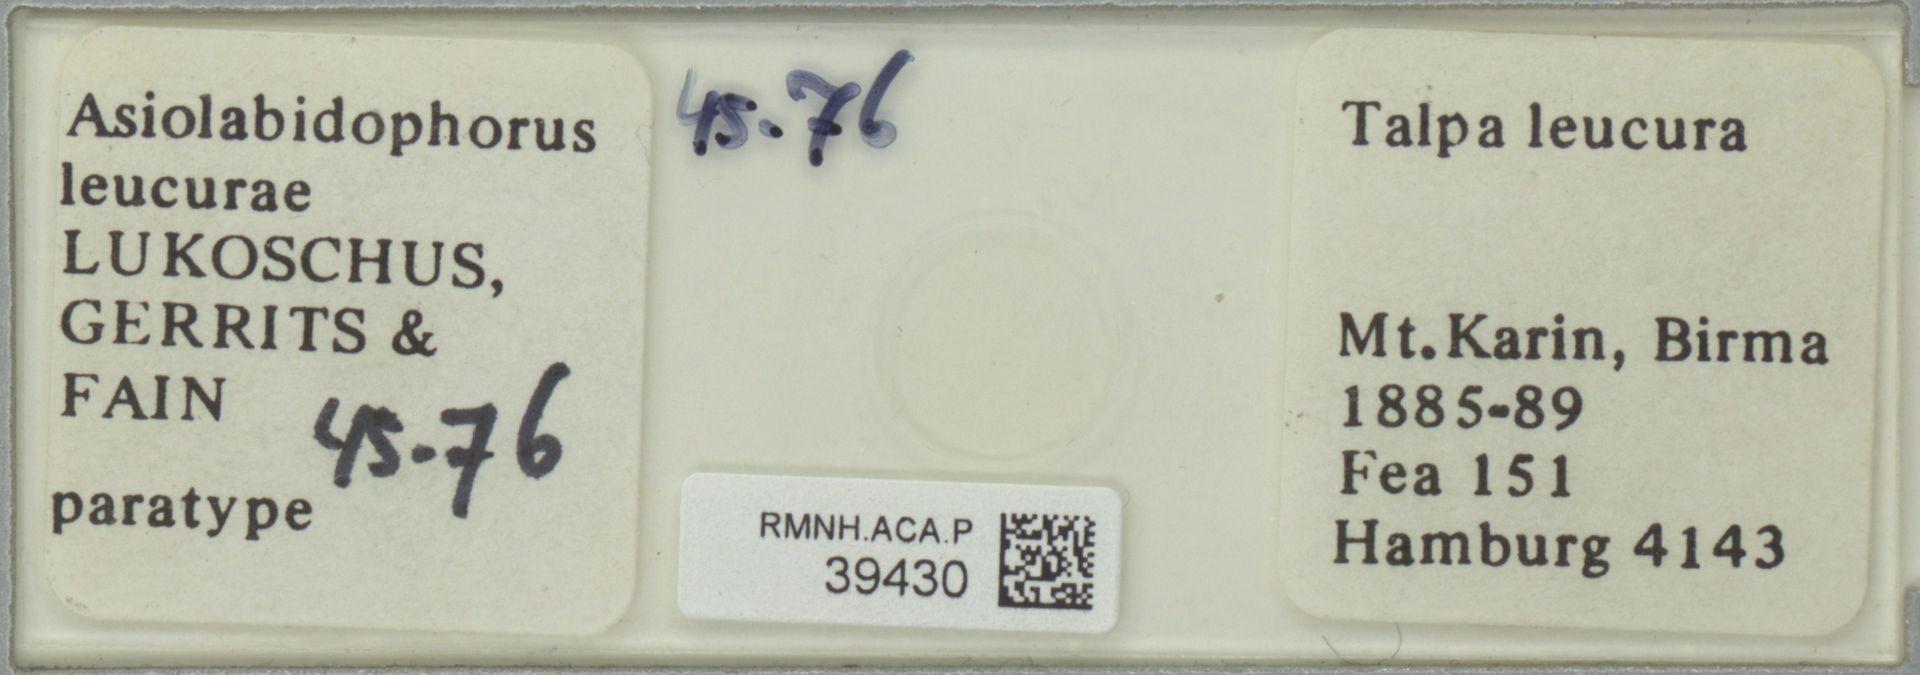 RMNH.ACA.P.39430 | Asiolabidophorus leucurae Lukoschus, Gerrits & Fain